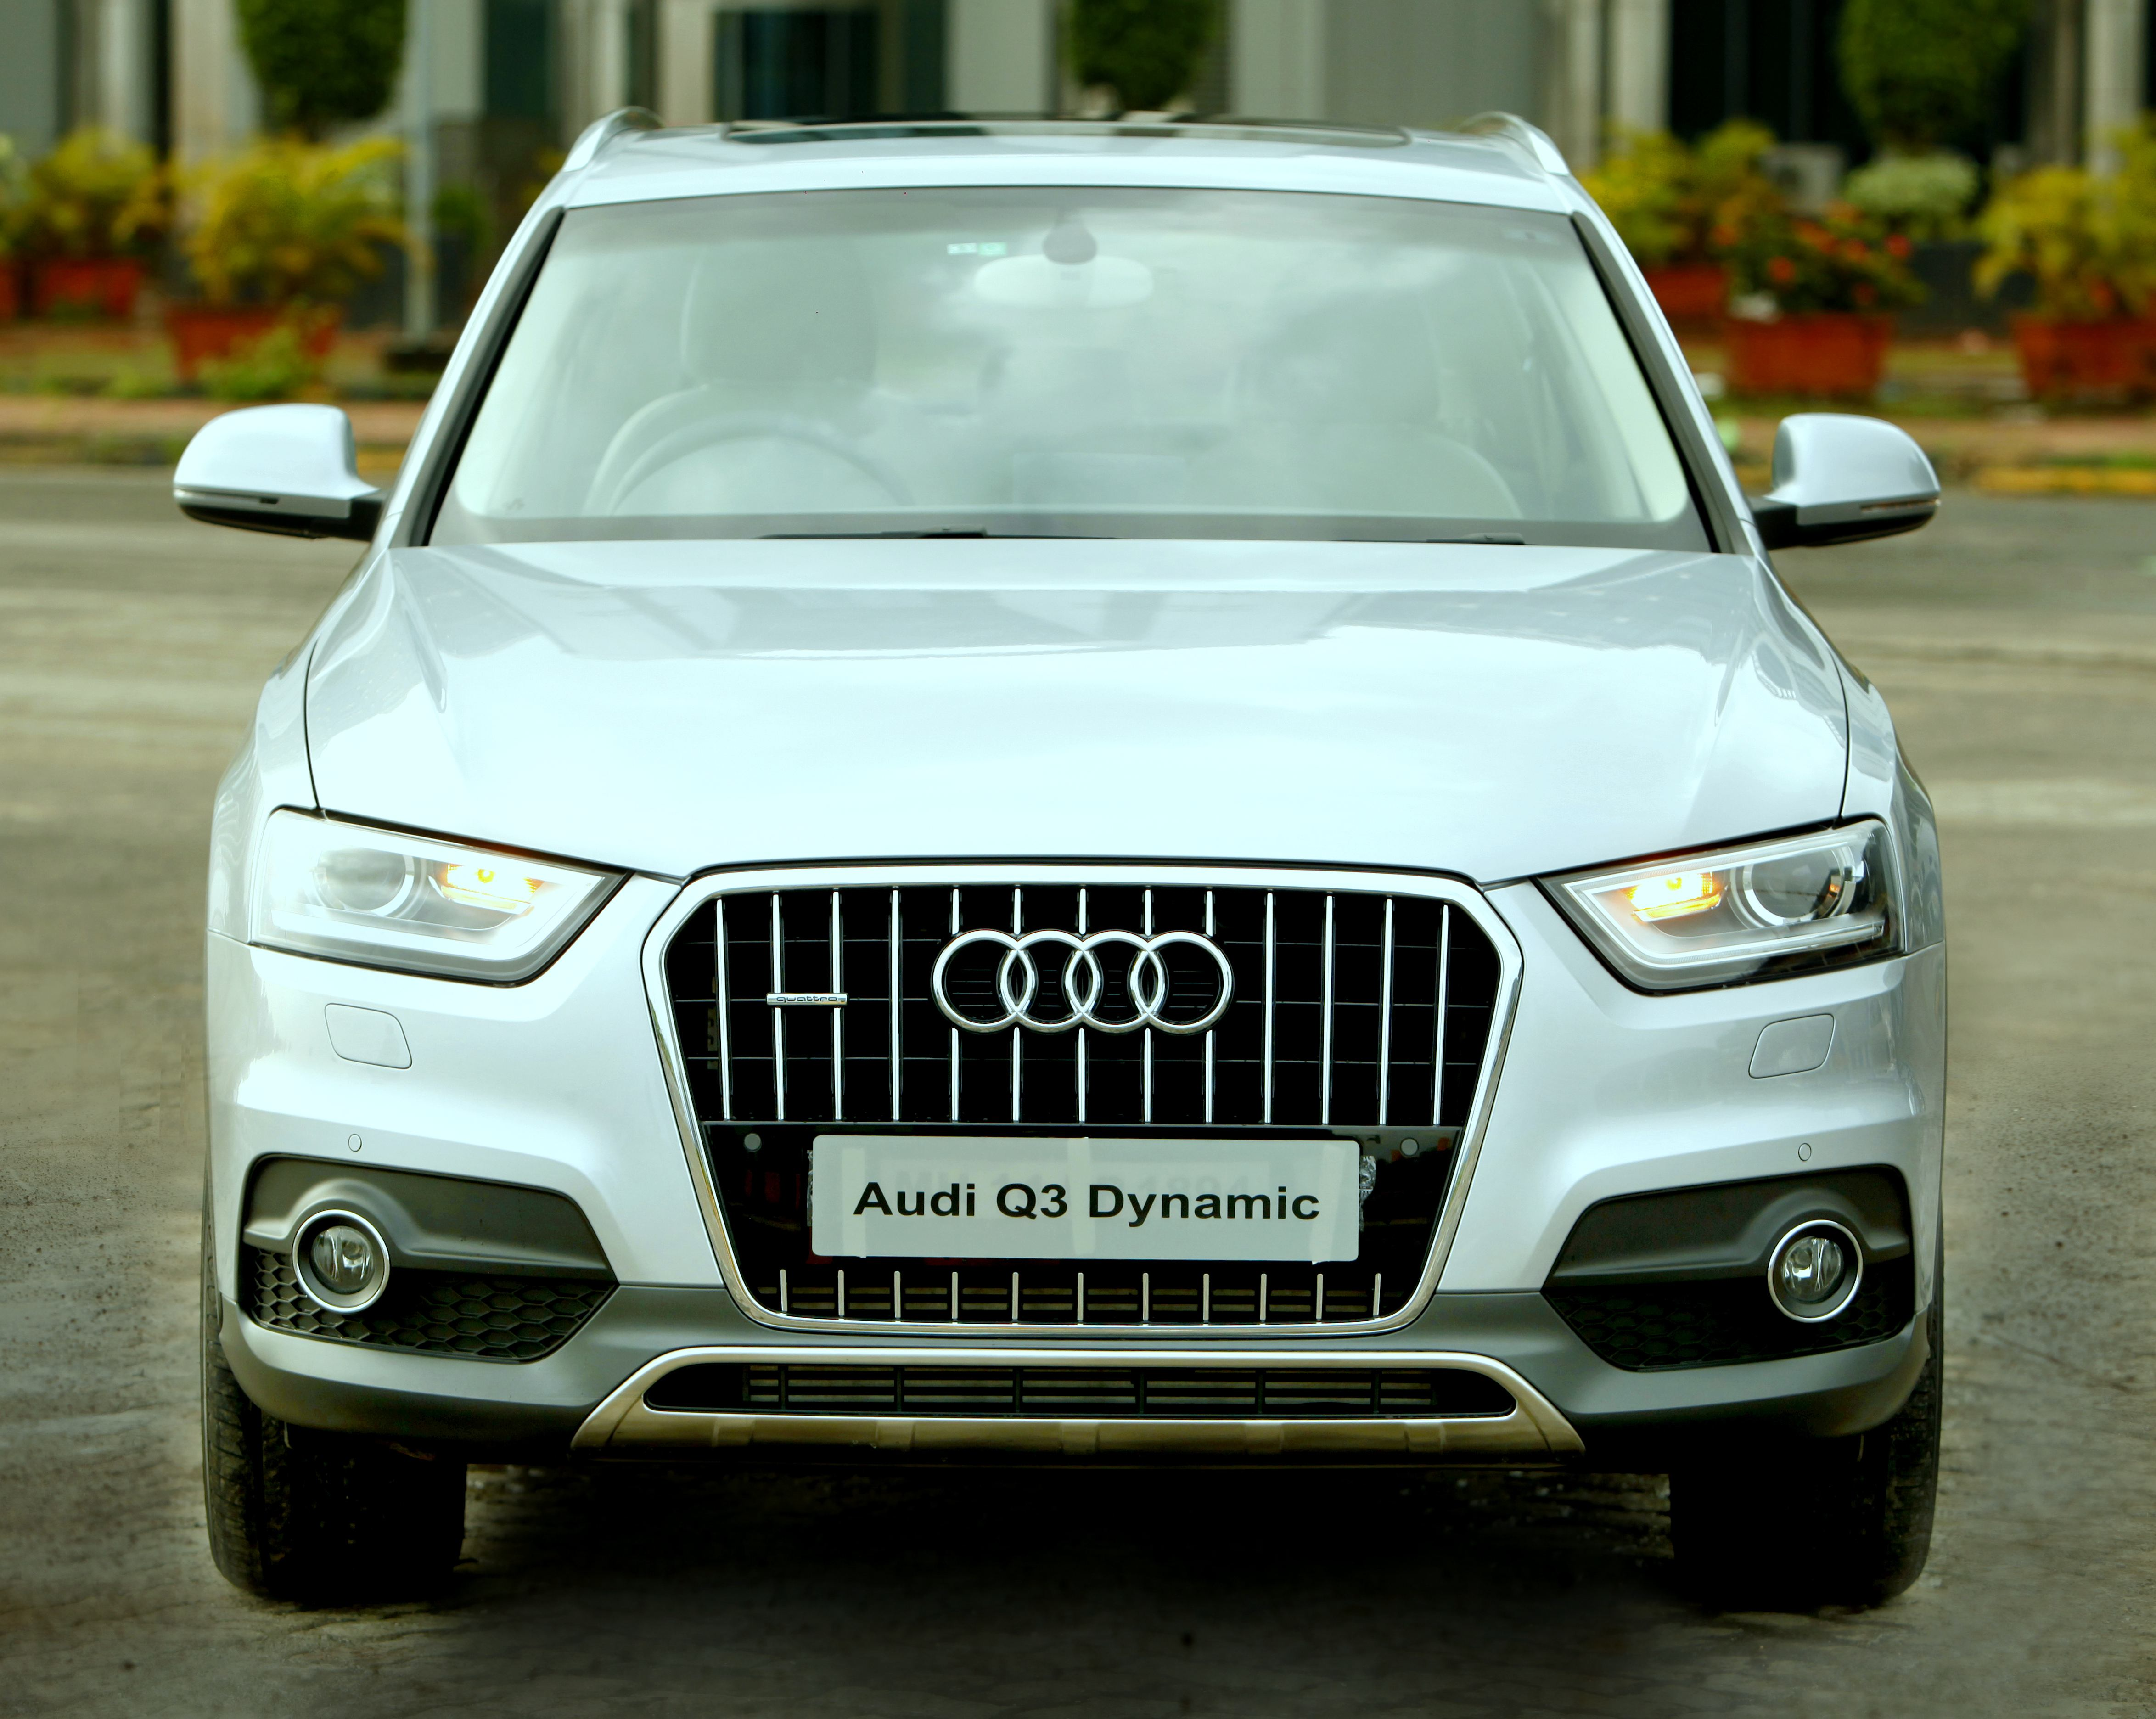 Audi Q Expands Its Range Introduces Audi Q Dynamic - Audi car q3 price in india